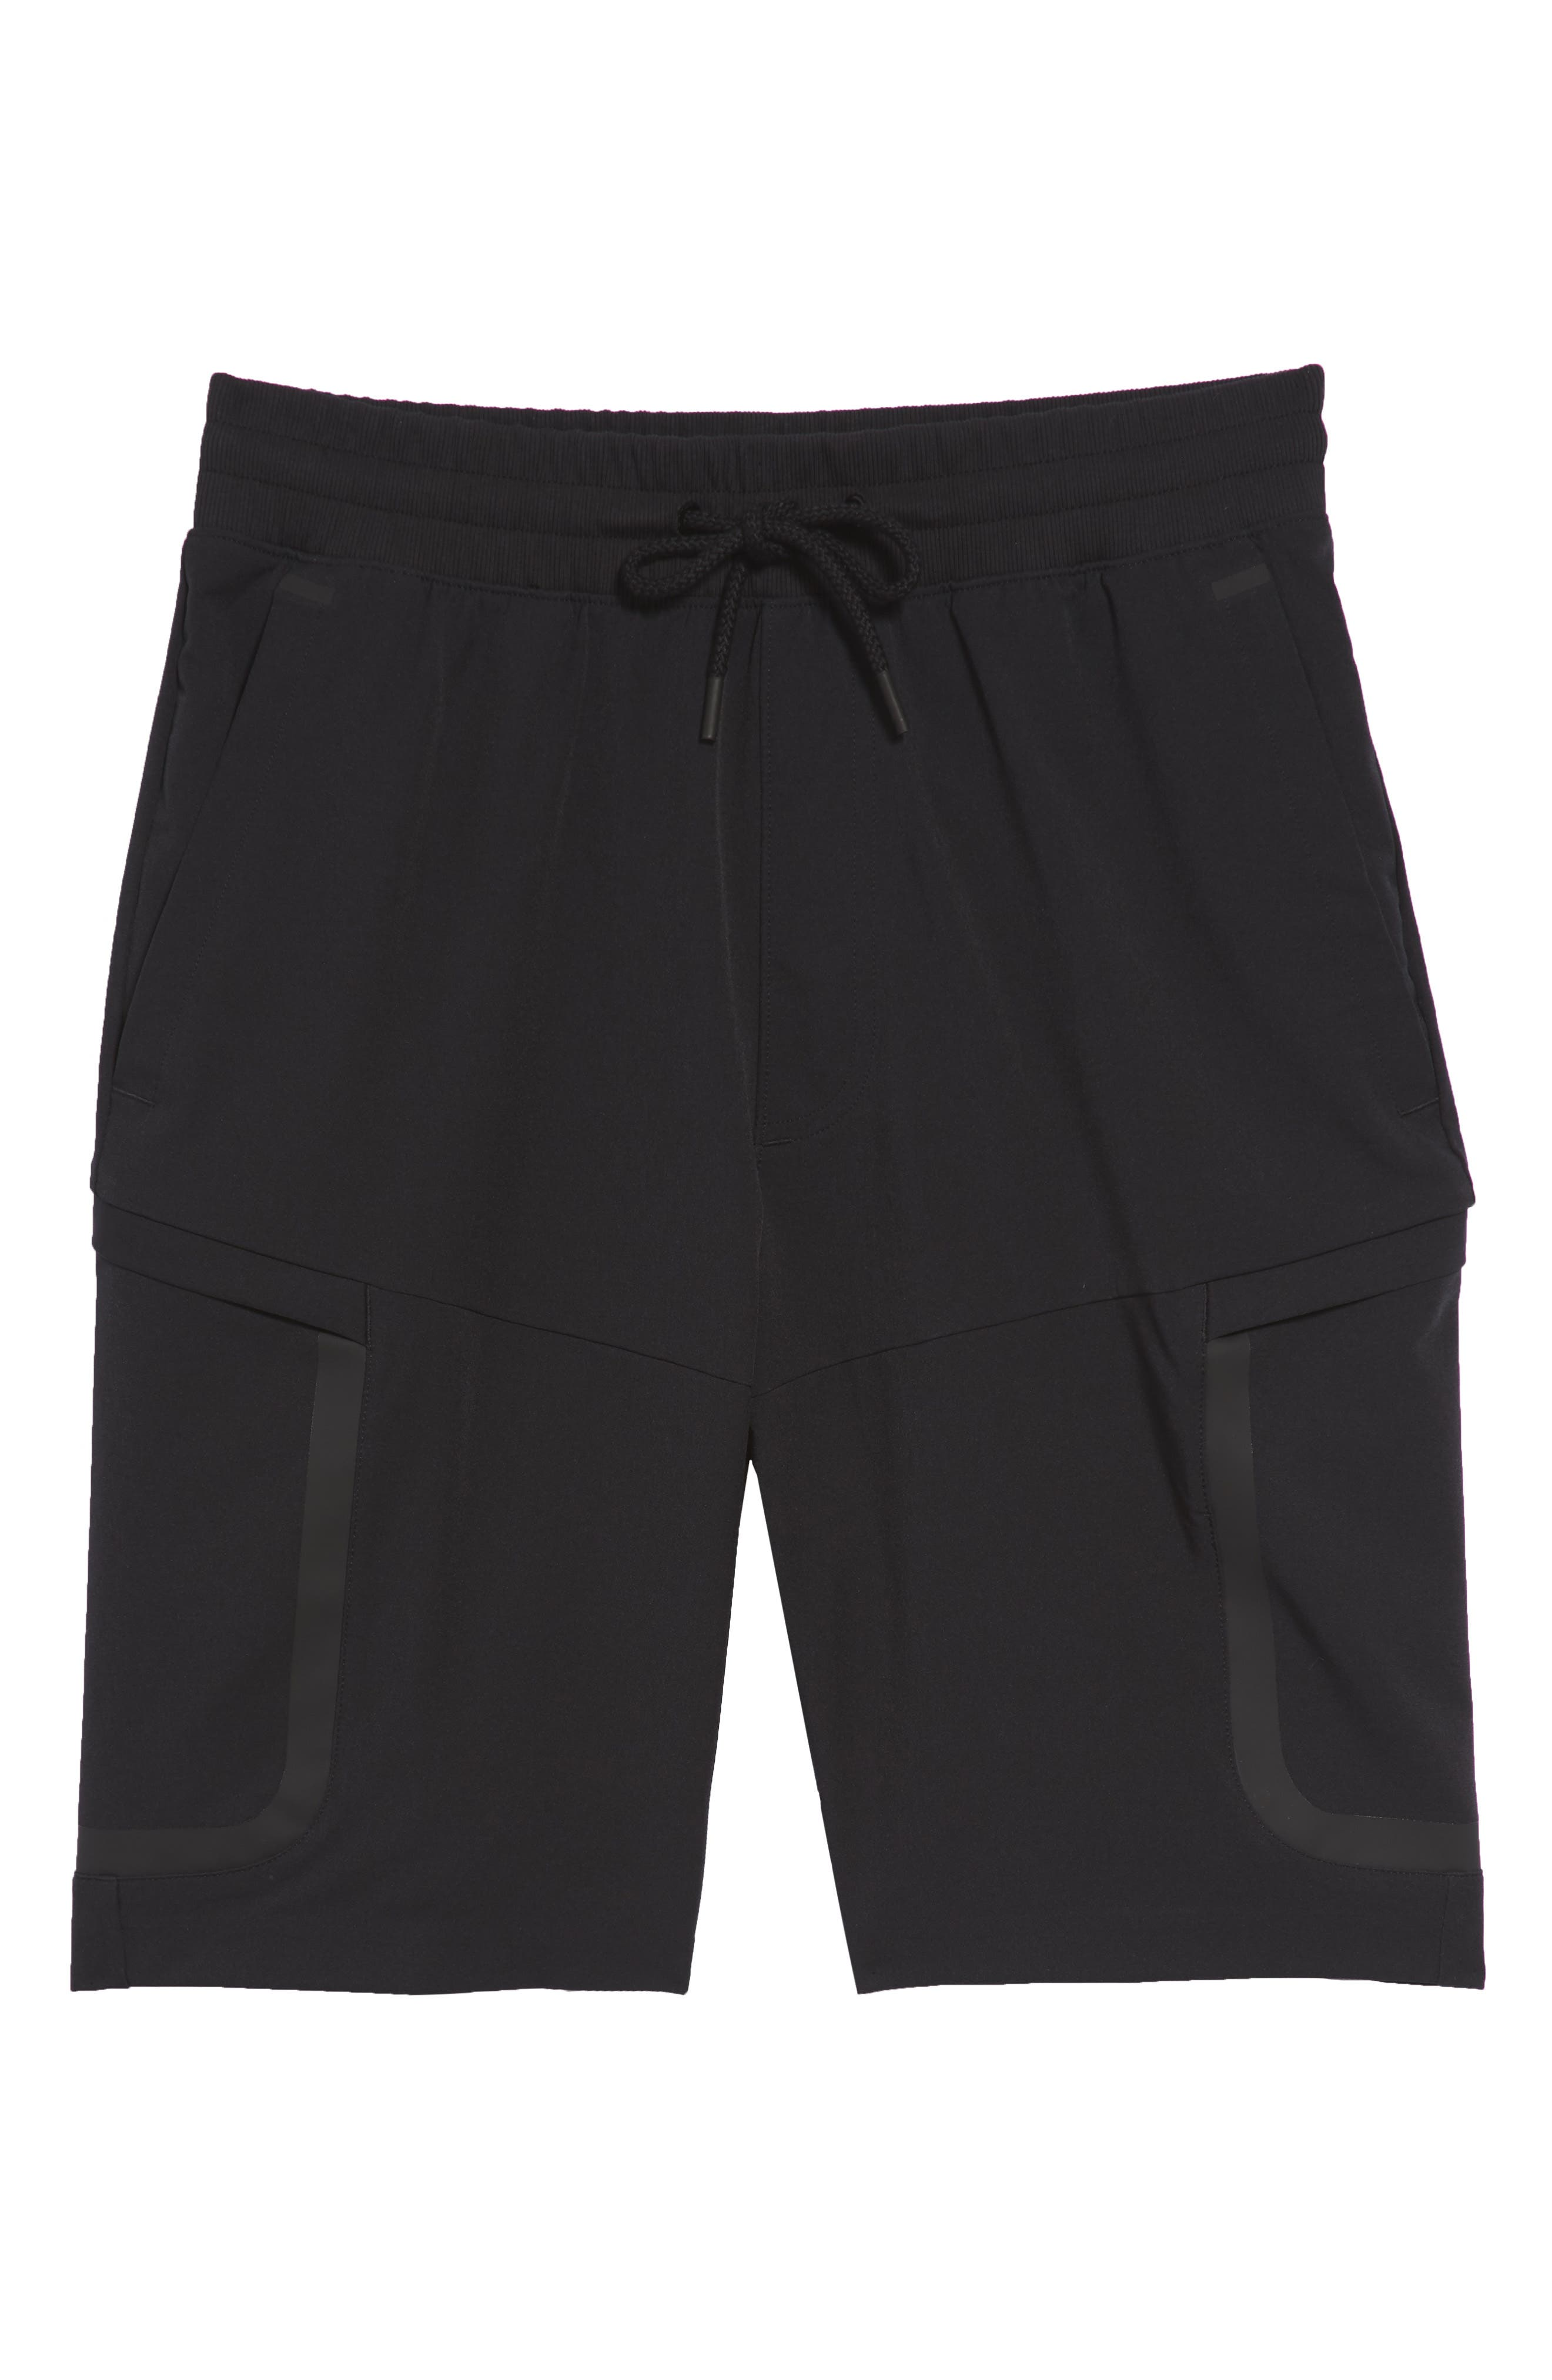 Sportstyle Elite Cargo Shorts,                             Alternate thumbnail 6, color,                             001